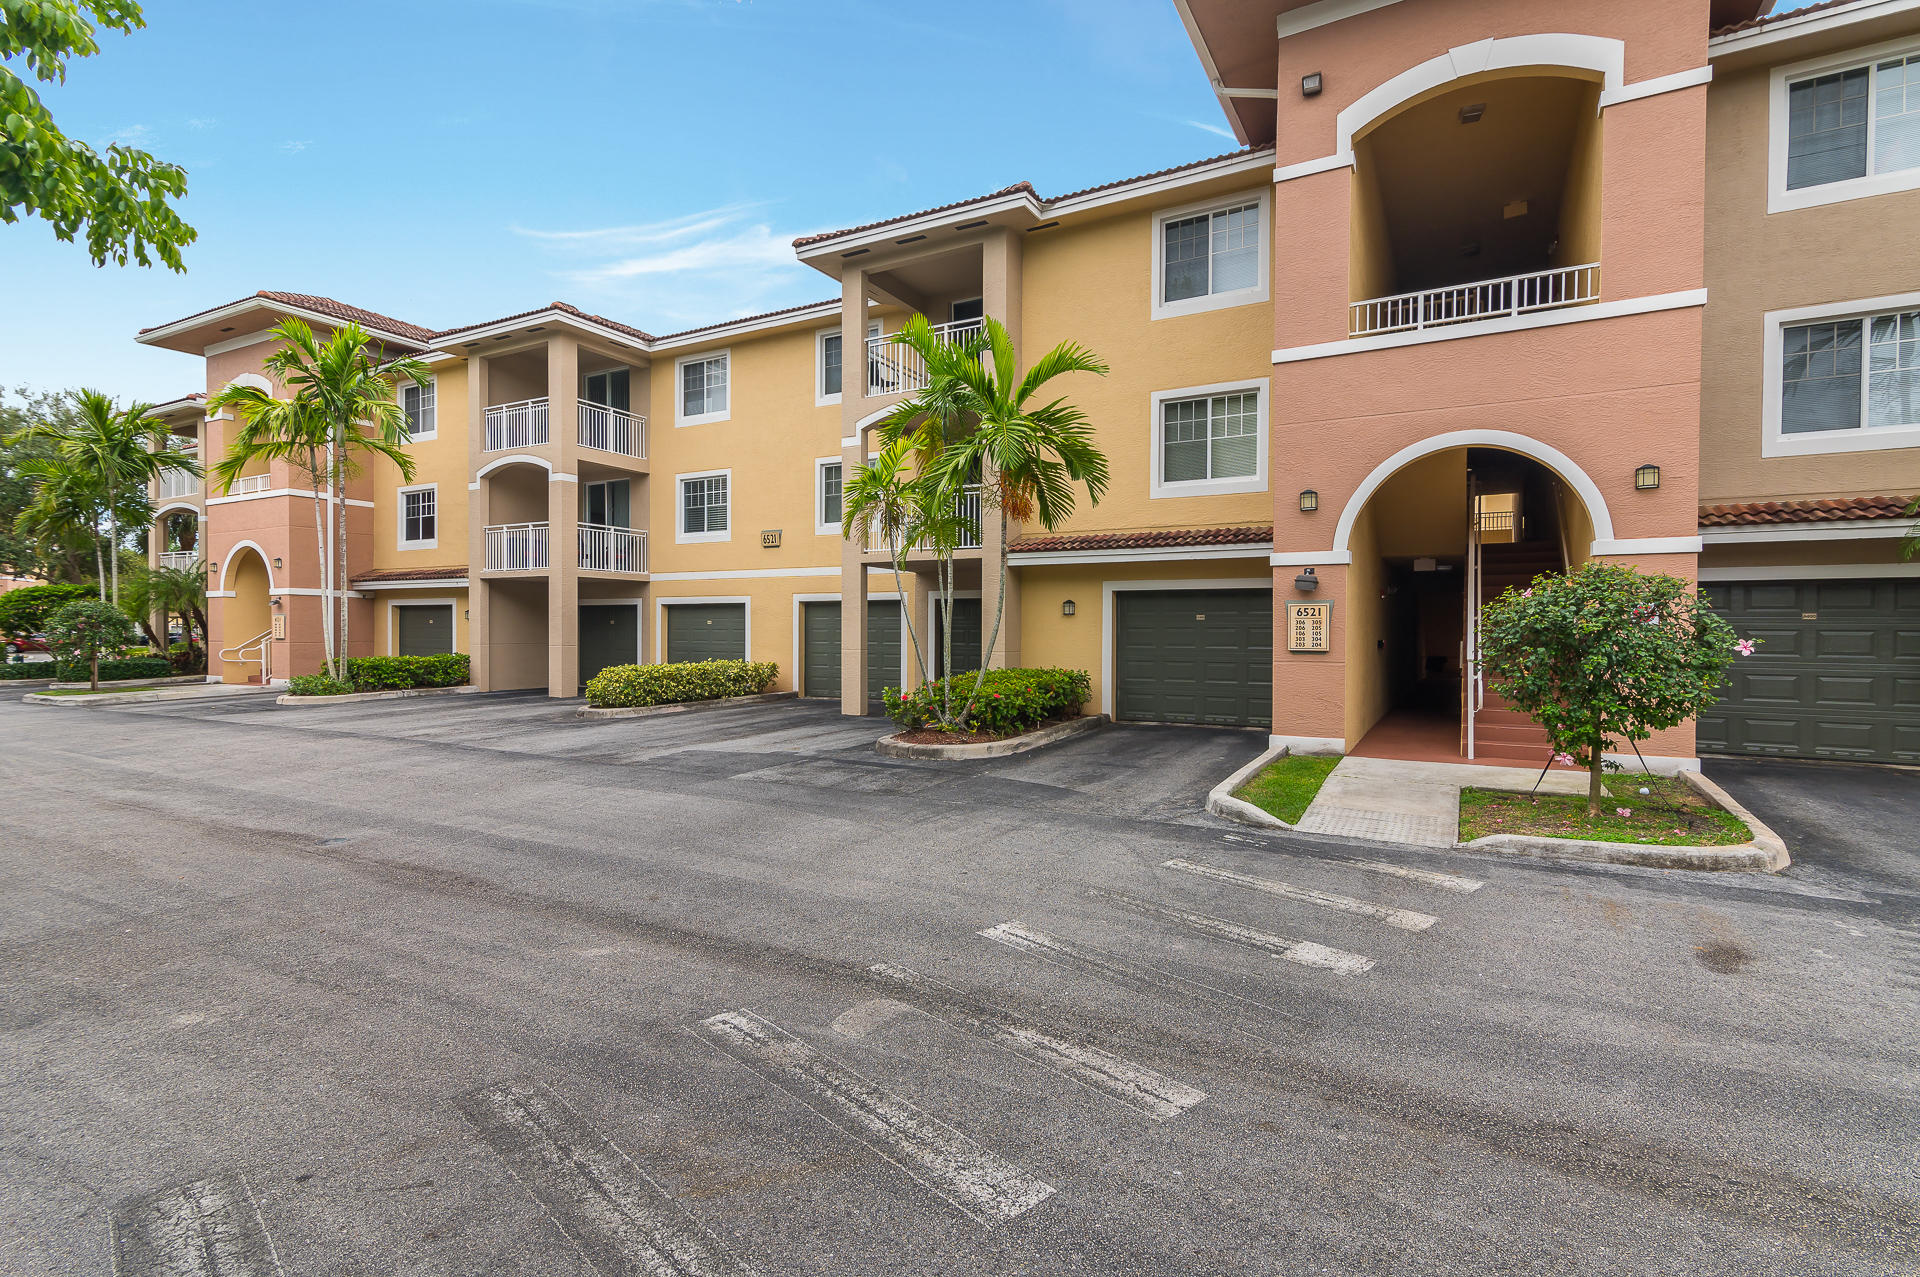 6521  Emerald Dunes Drive 105 For Sale 10714374, FL